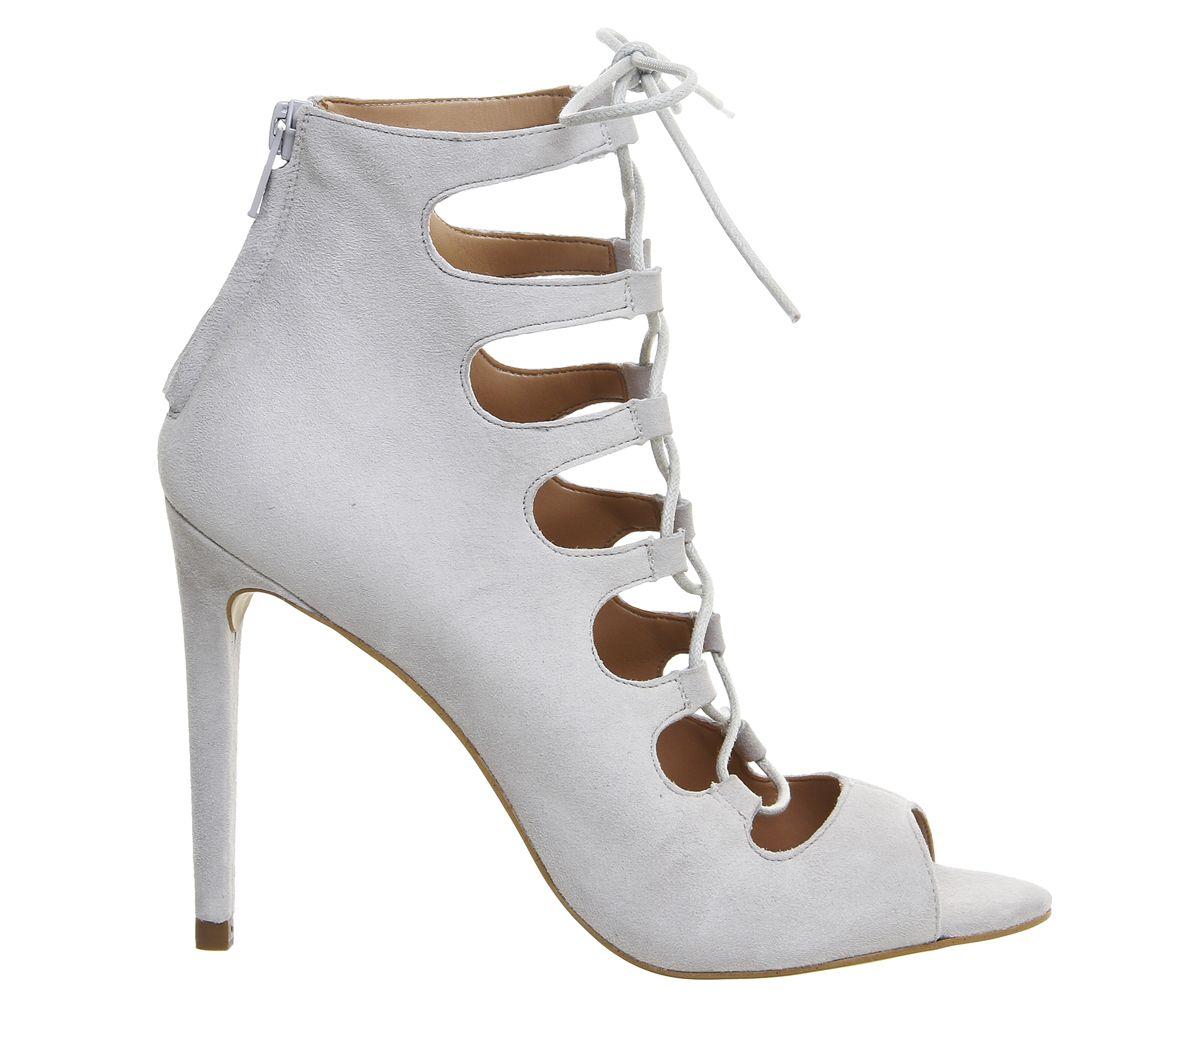 270ef8cc077b Office Parisian Lace Up Ghillie Sandal Grey Kid Suede - High Heels ...